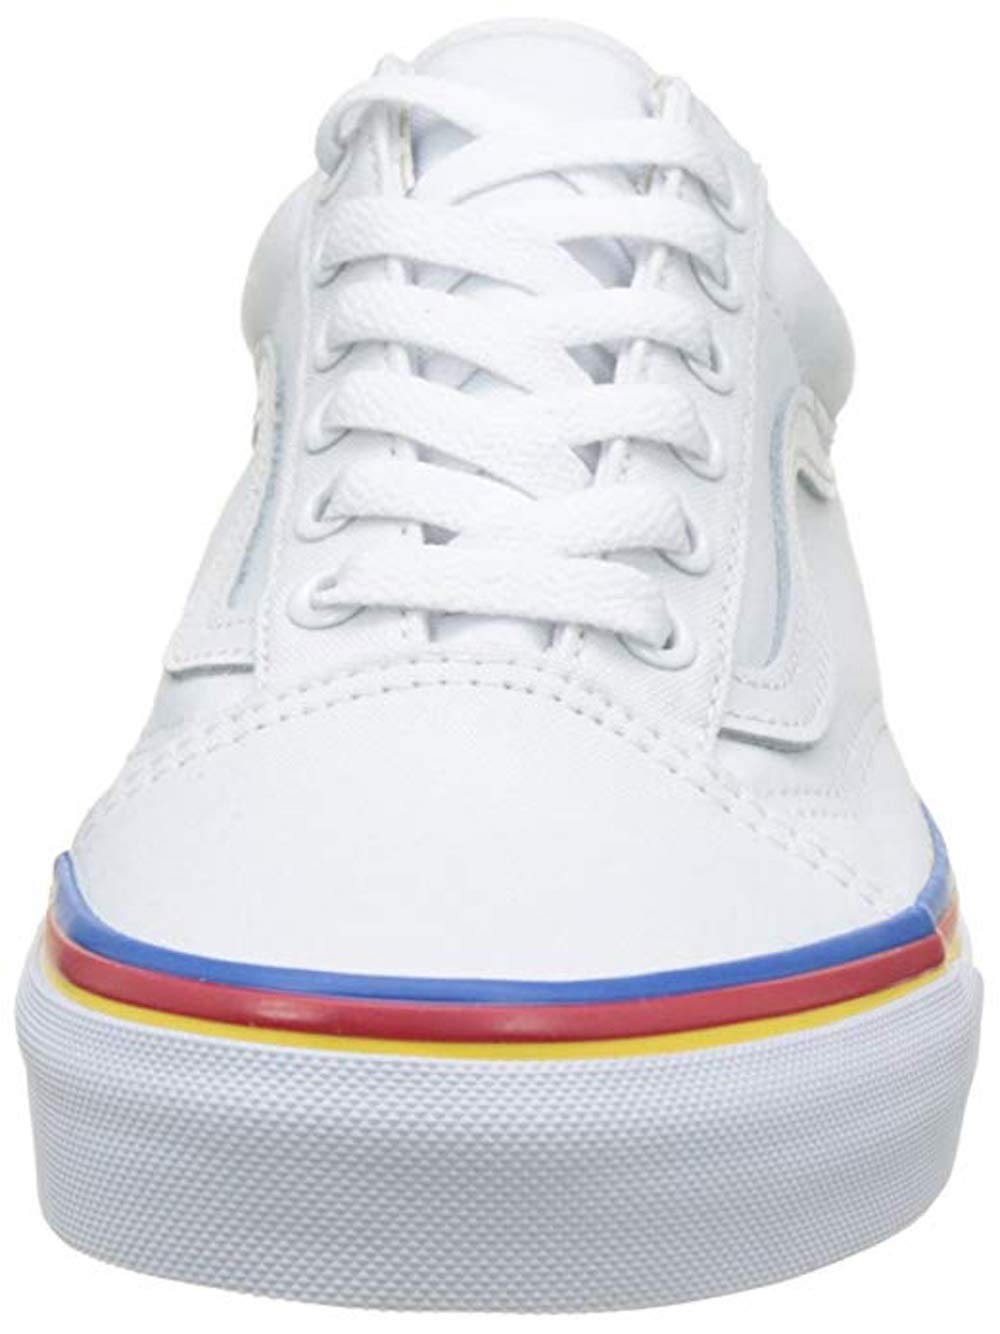 100c97b70dabf5 Vans - Vans Unisex Old School True White Rainbow Foxing Lifestyle Sneaker -  Walmart.com